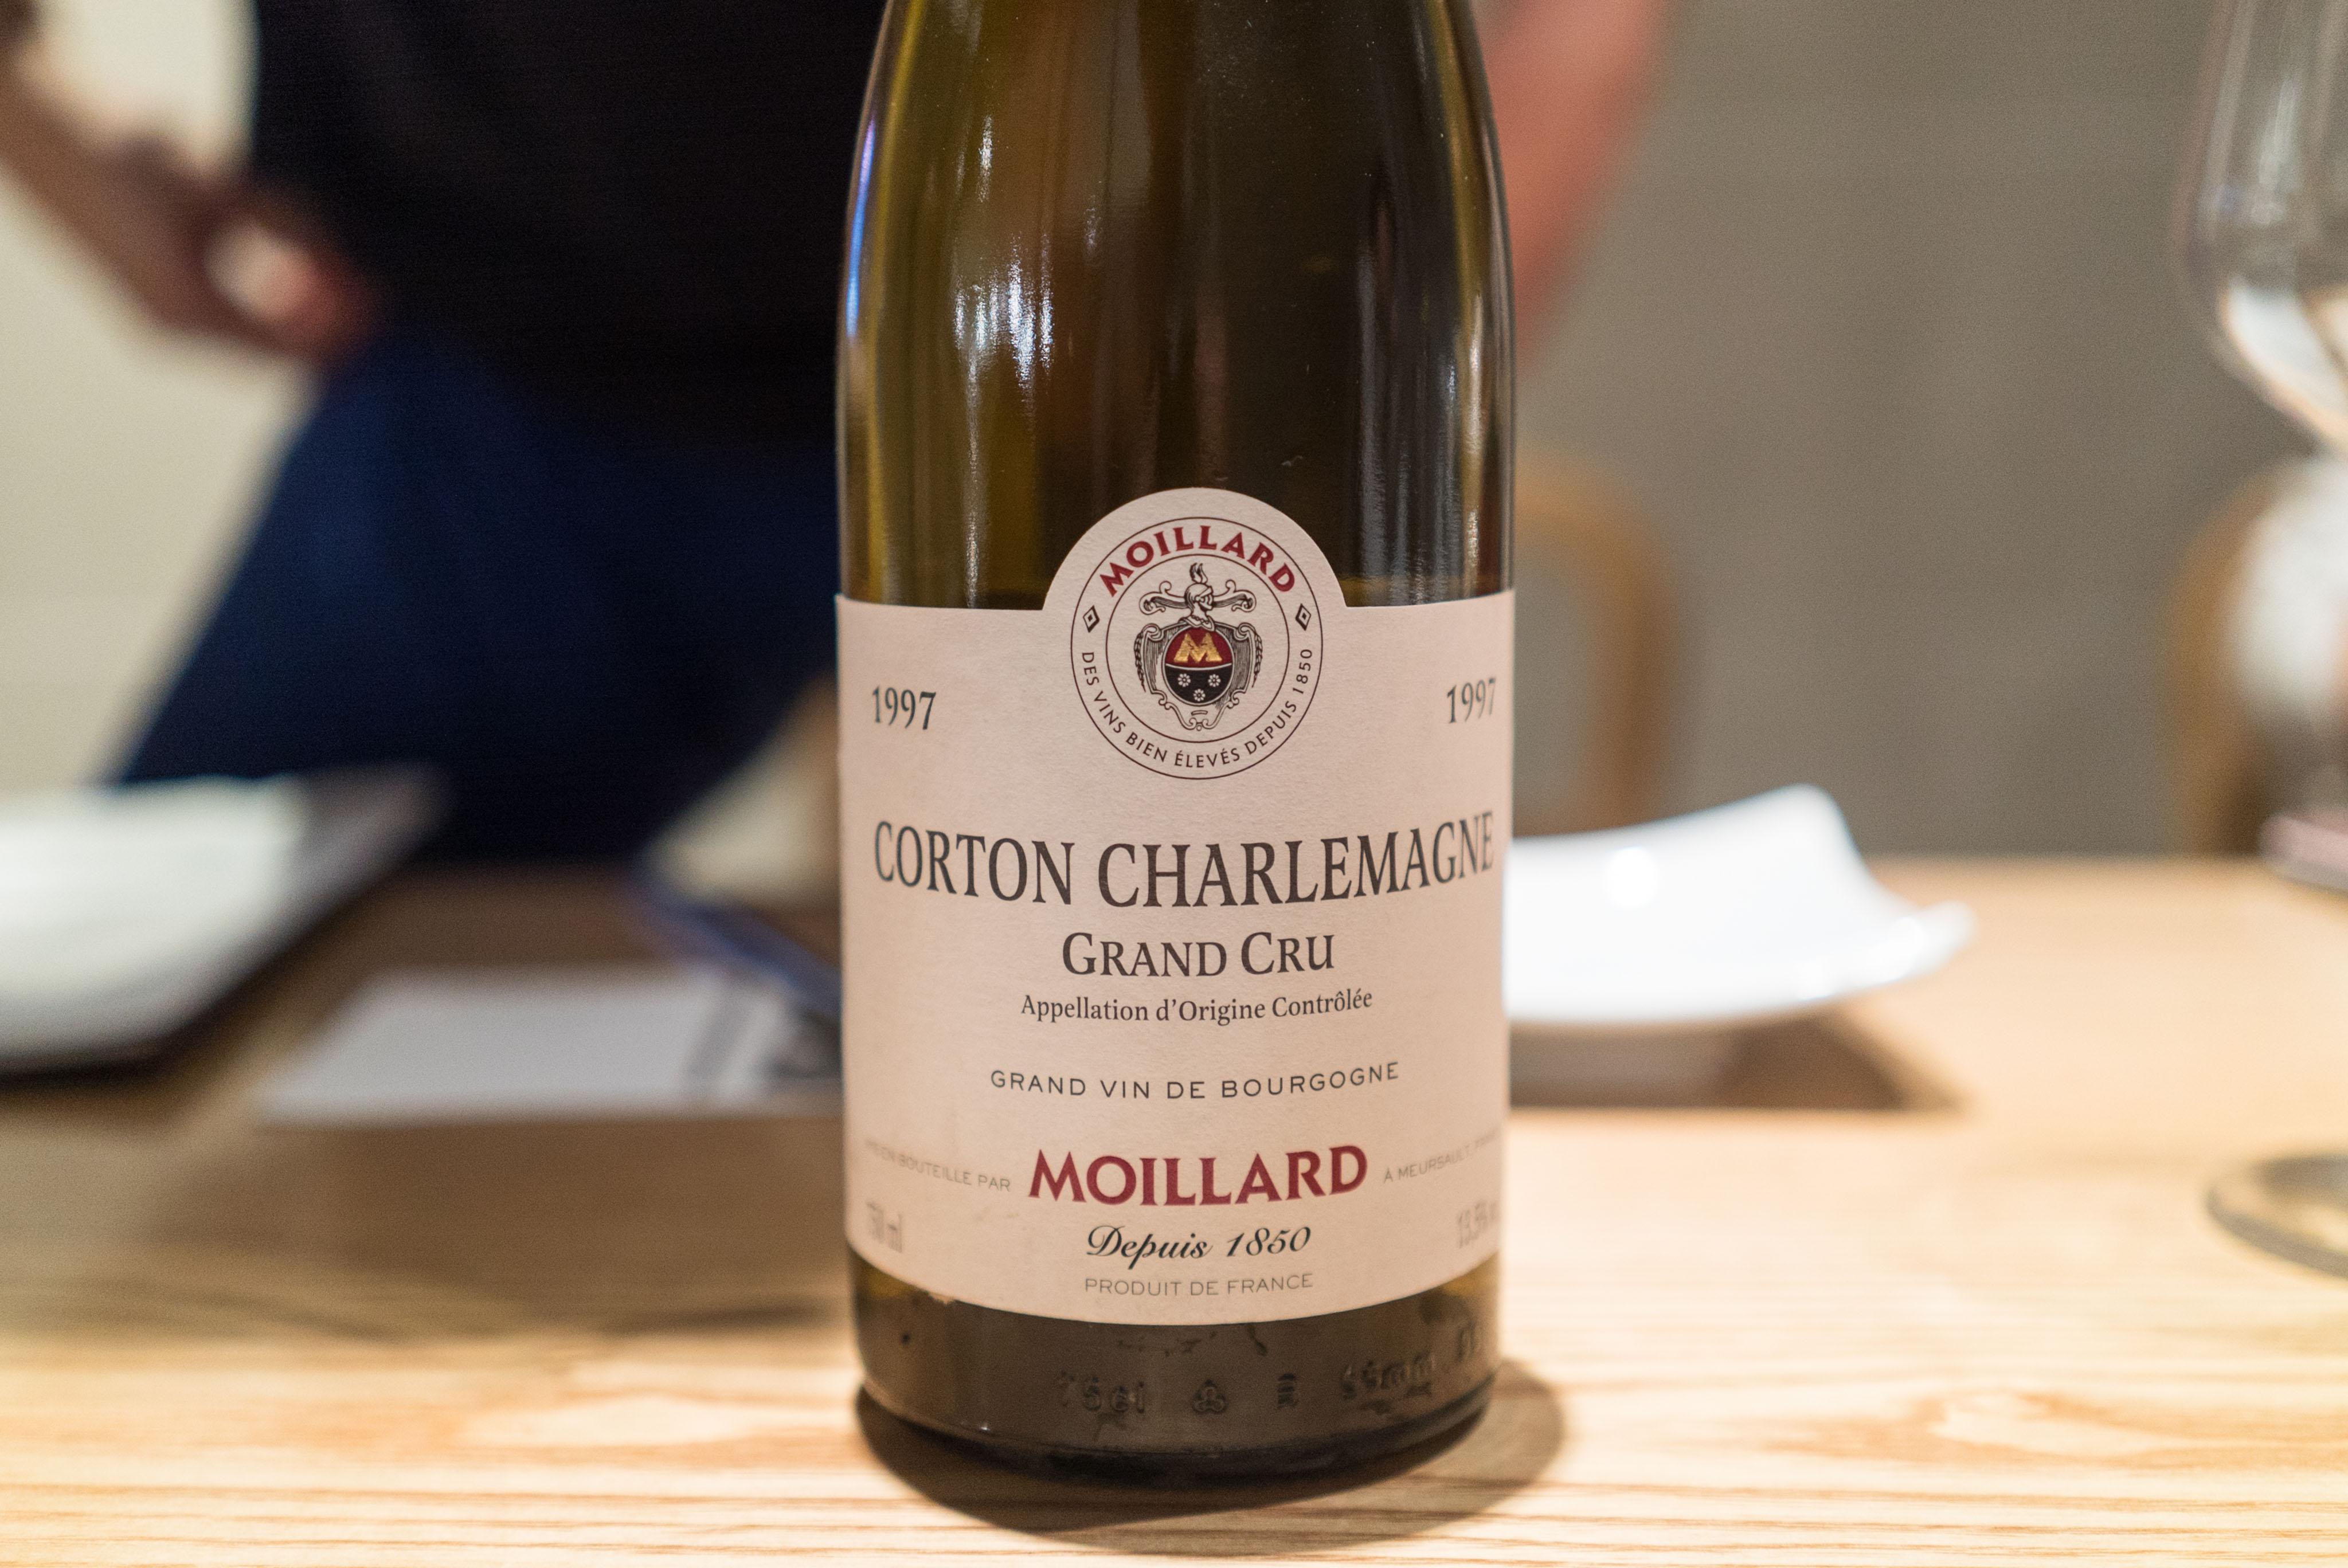 Moillard Corton Charlemagne Grand Cru 1997